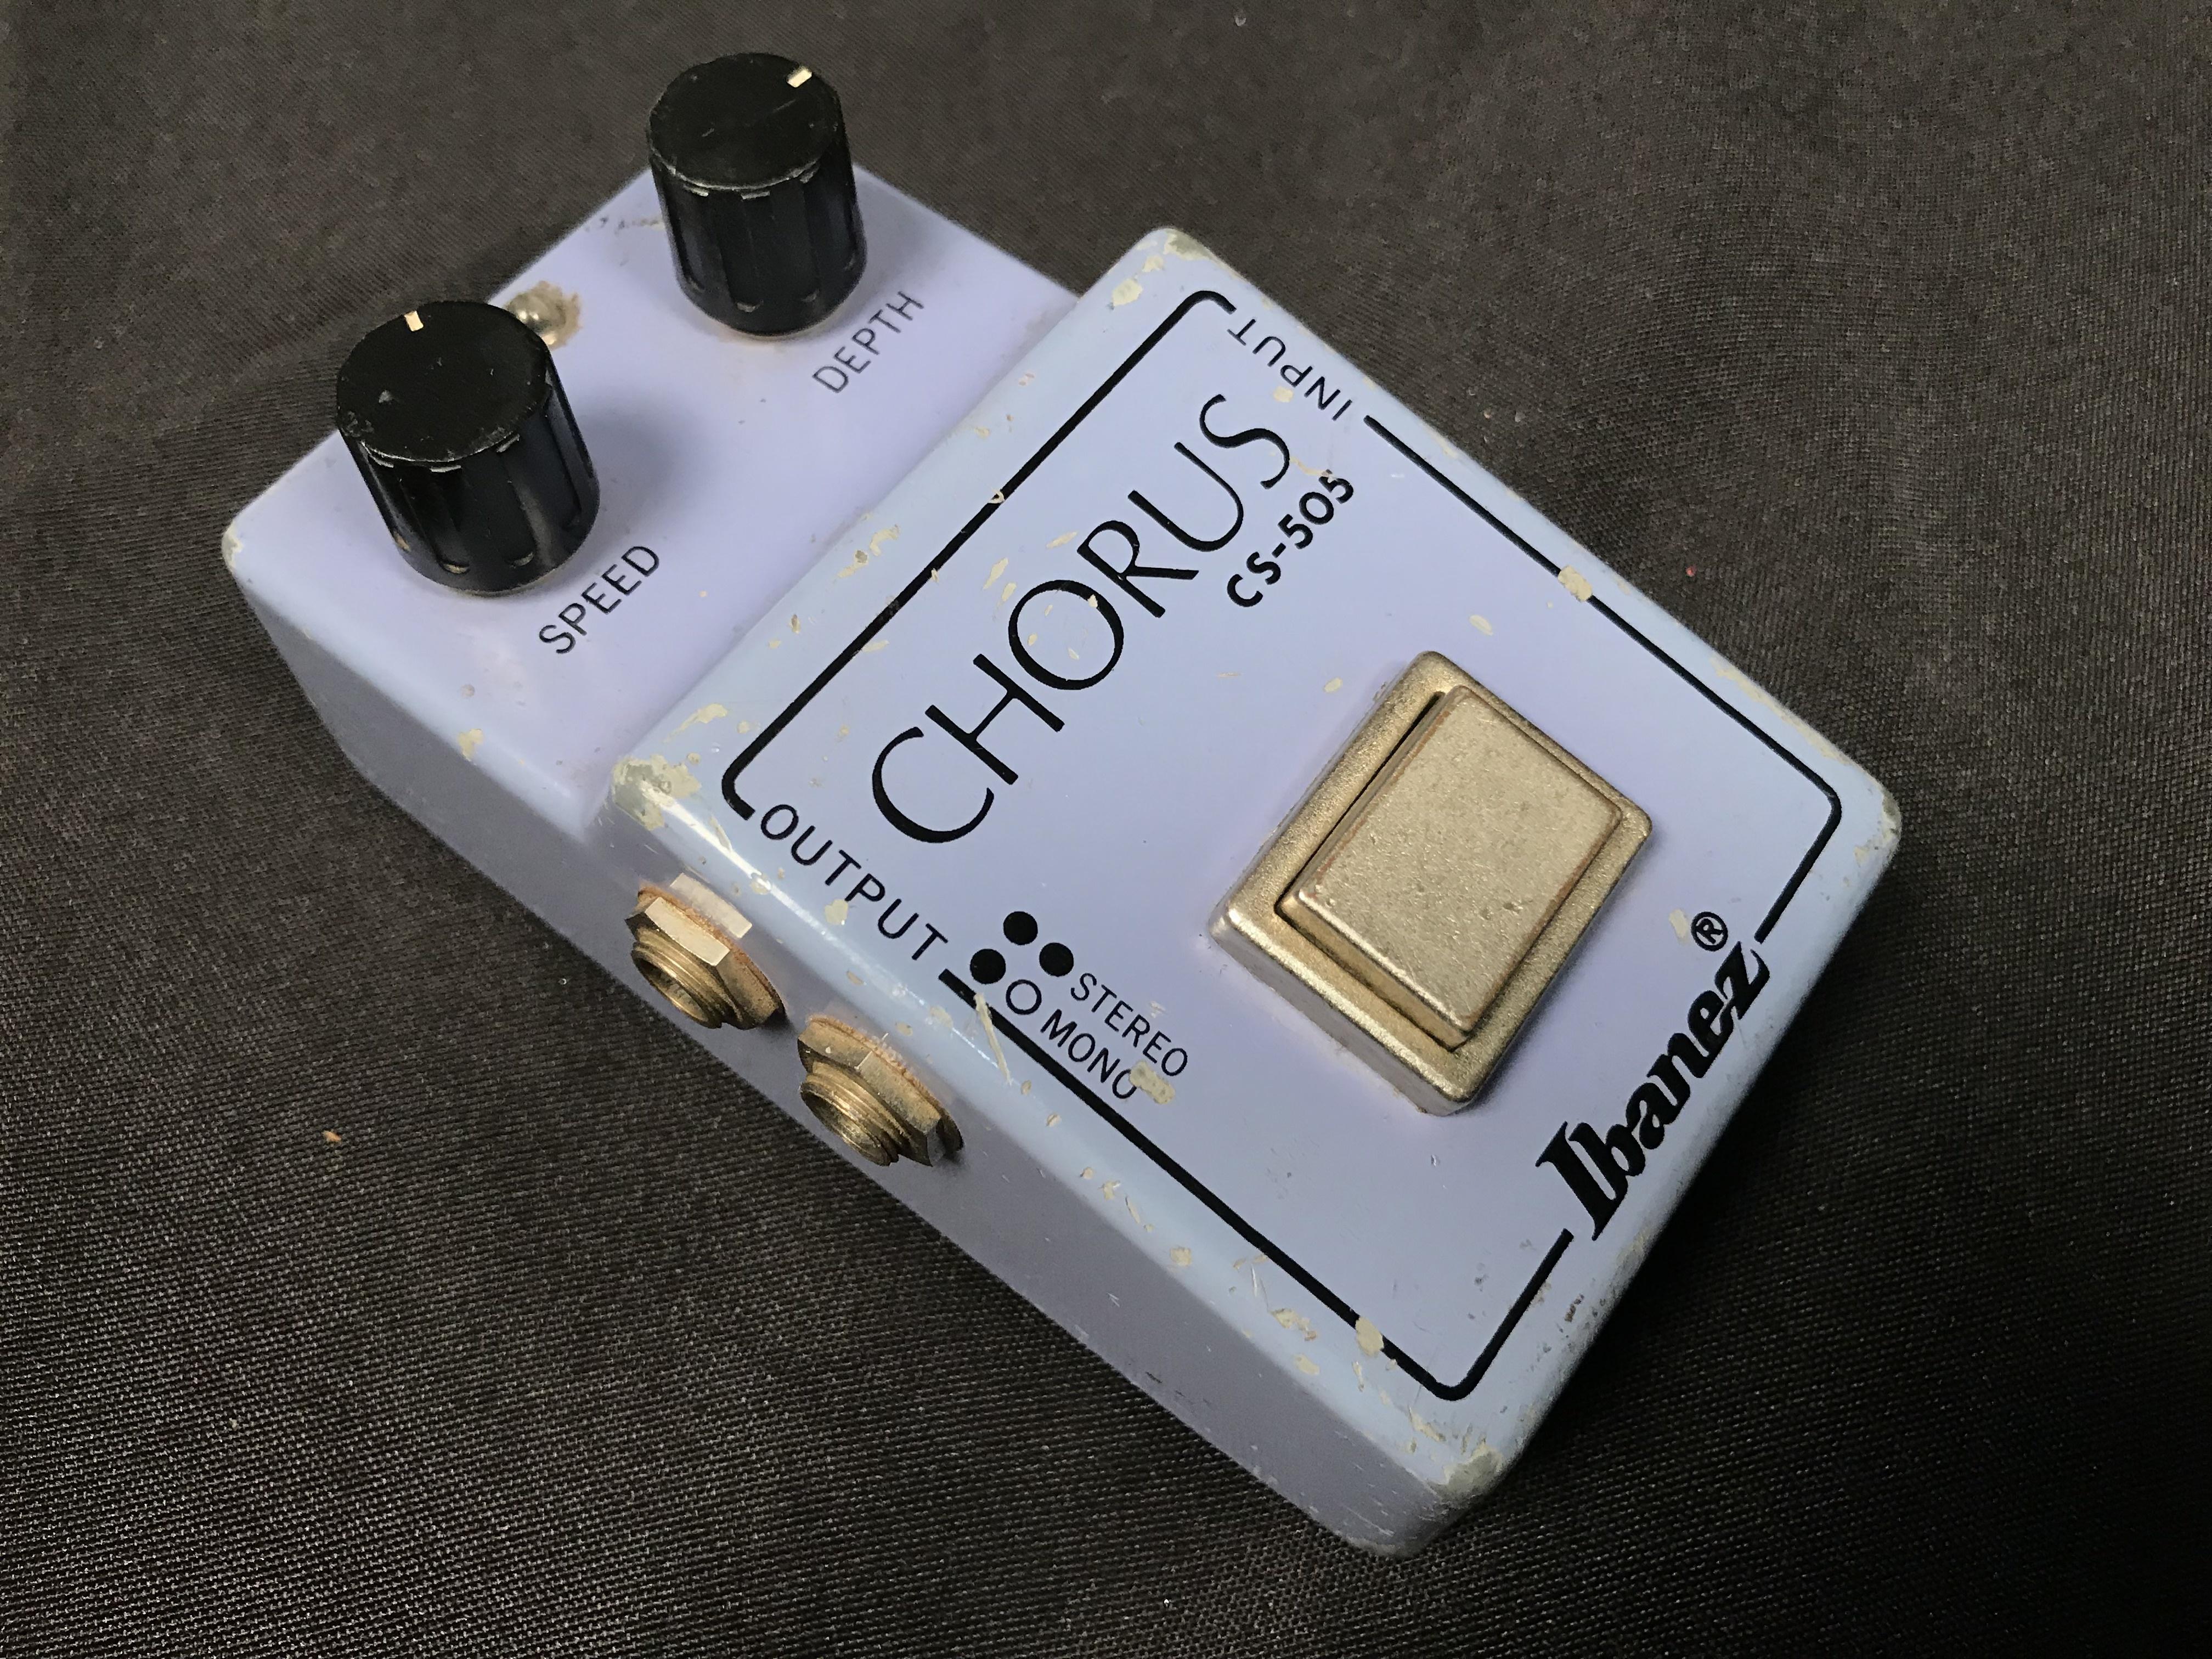 IBANEZ CS-505 MIJ 1980 Stereo Chorus Effect Pedal